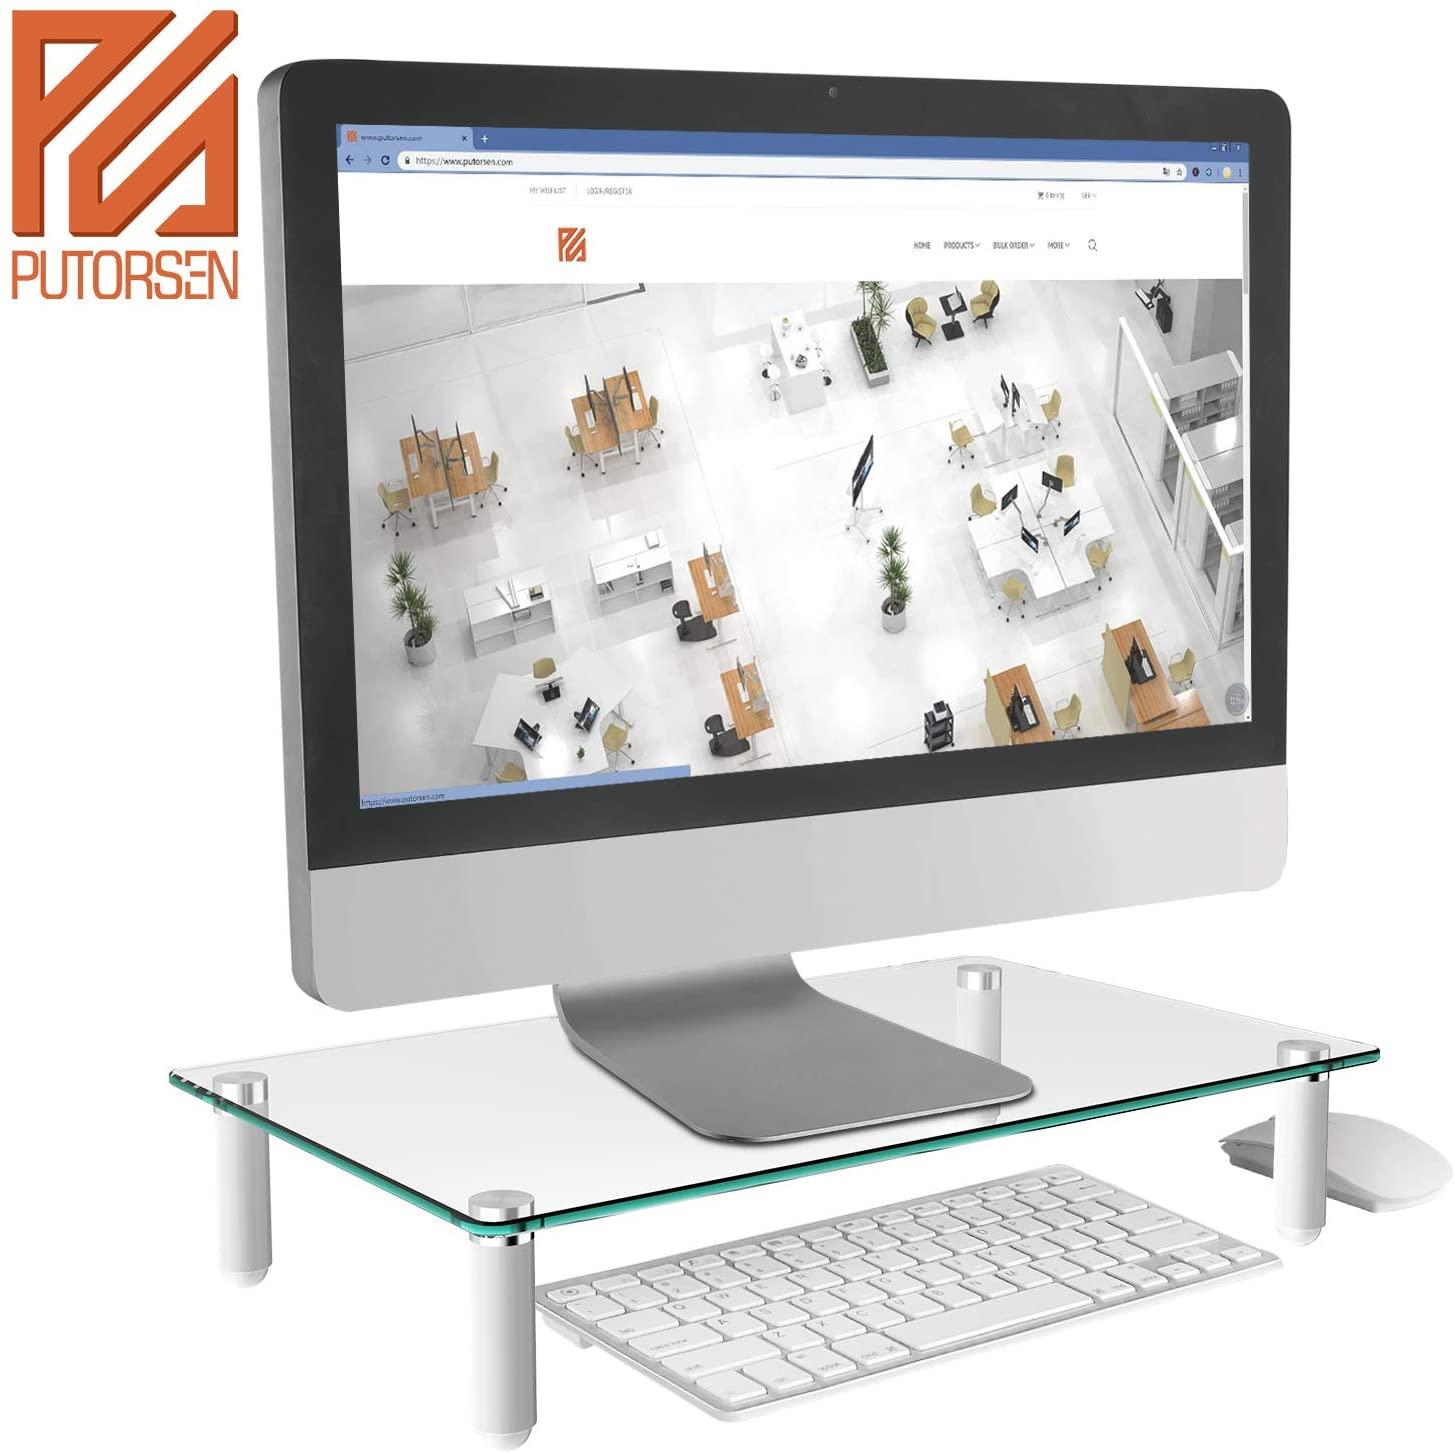 Soporte para monitor de cristal PUTORSEN MRS-311